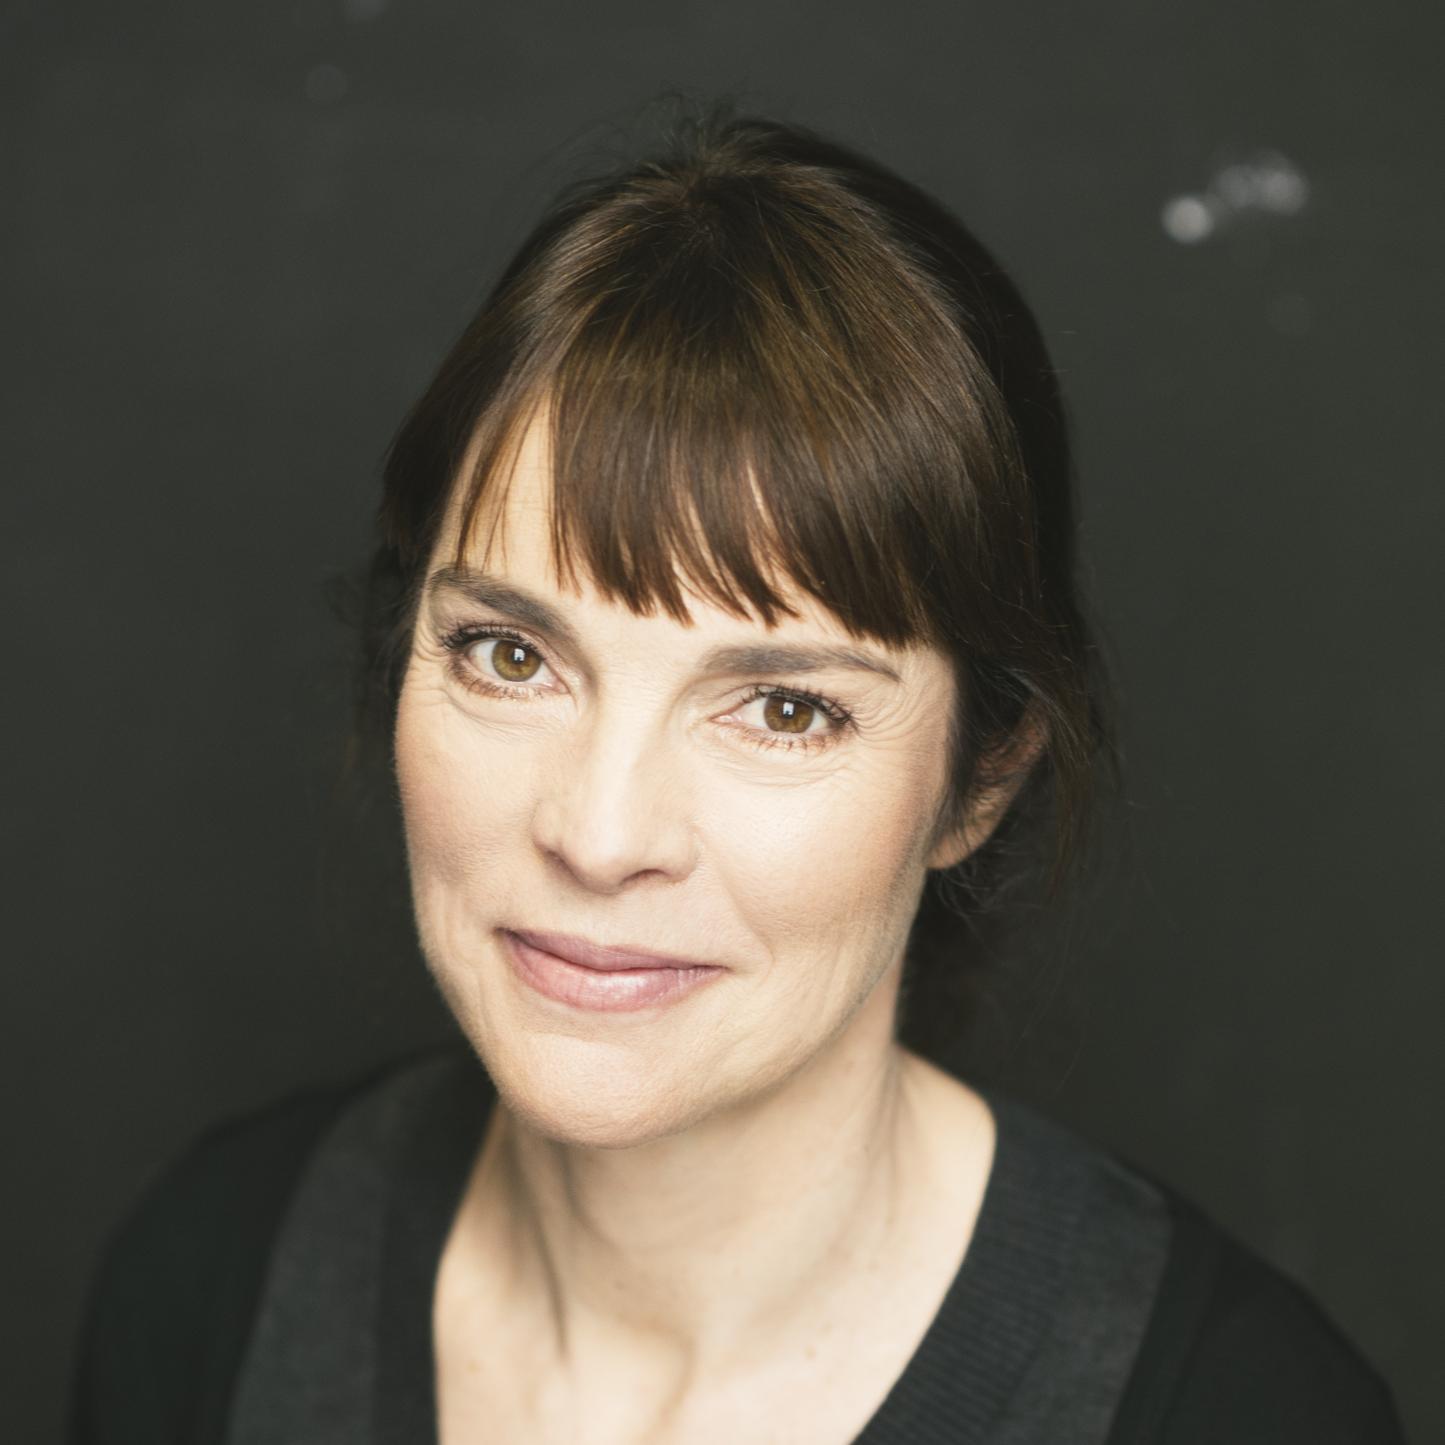 Discussion on this topic: Wanda Opalinska, marine-johnson/